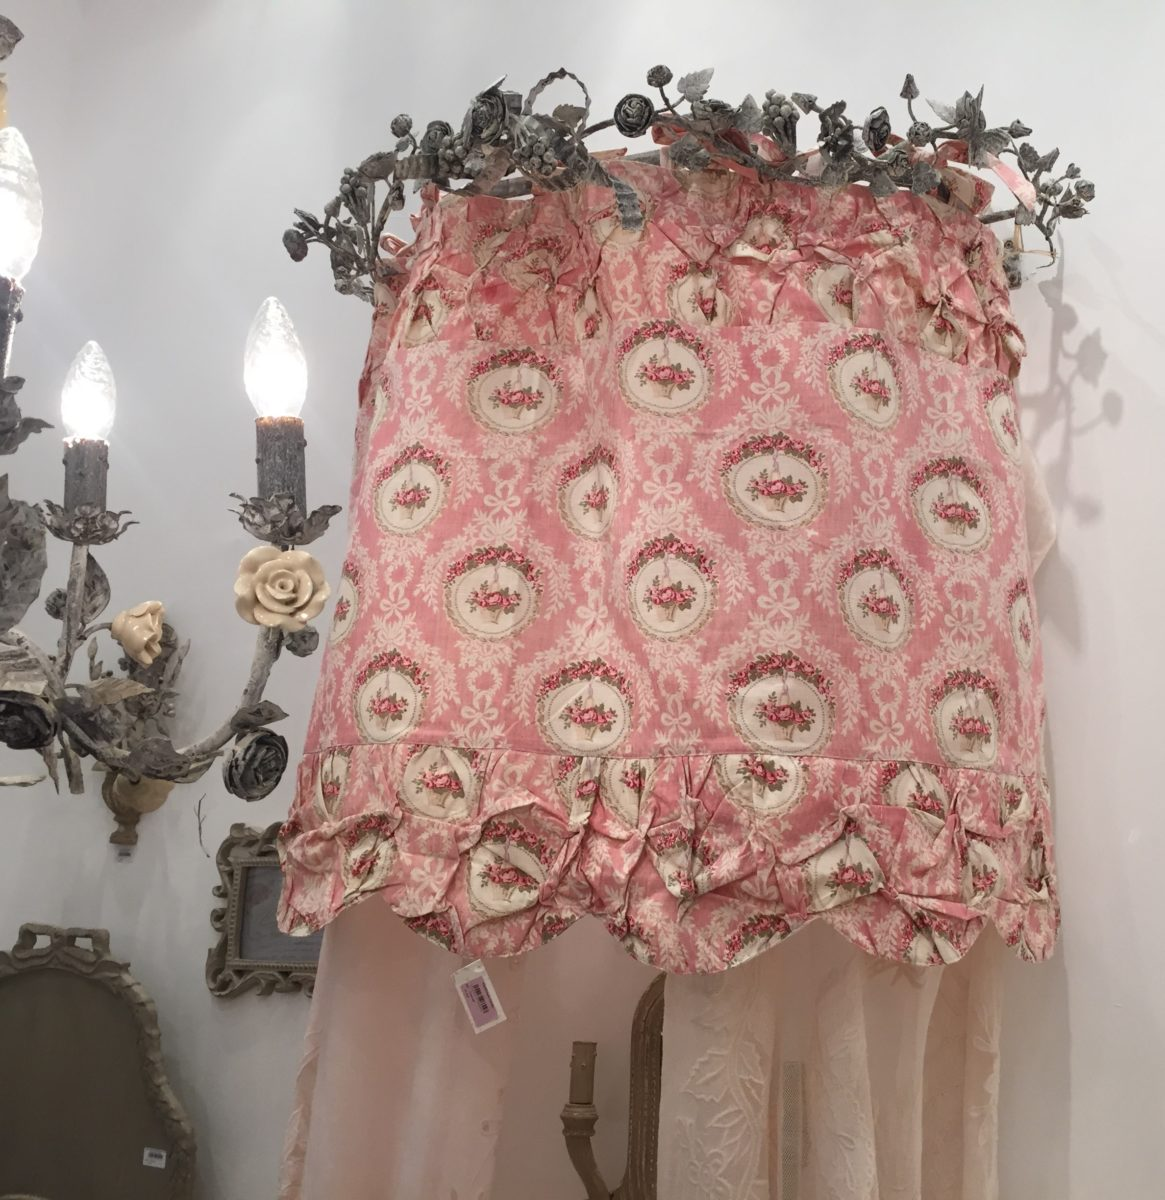 cantonni re guirlande de roses coquecigrues mod le cam e le monde de rose. Black Bedroom Furniture Sets. Home Design Ideas